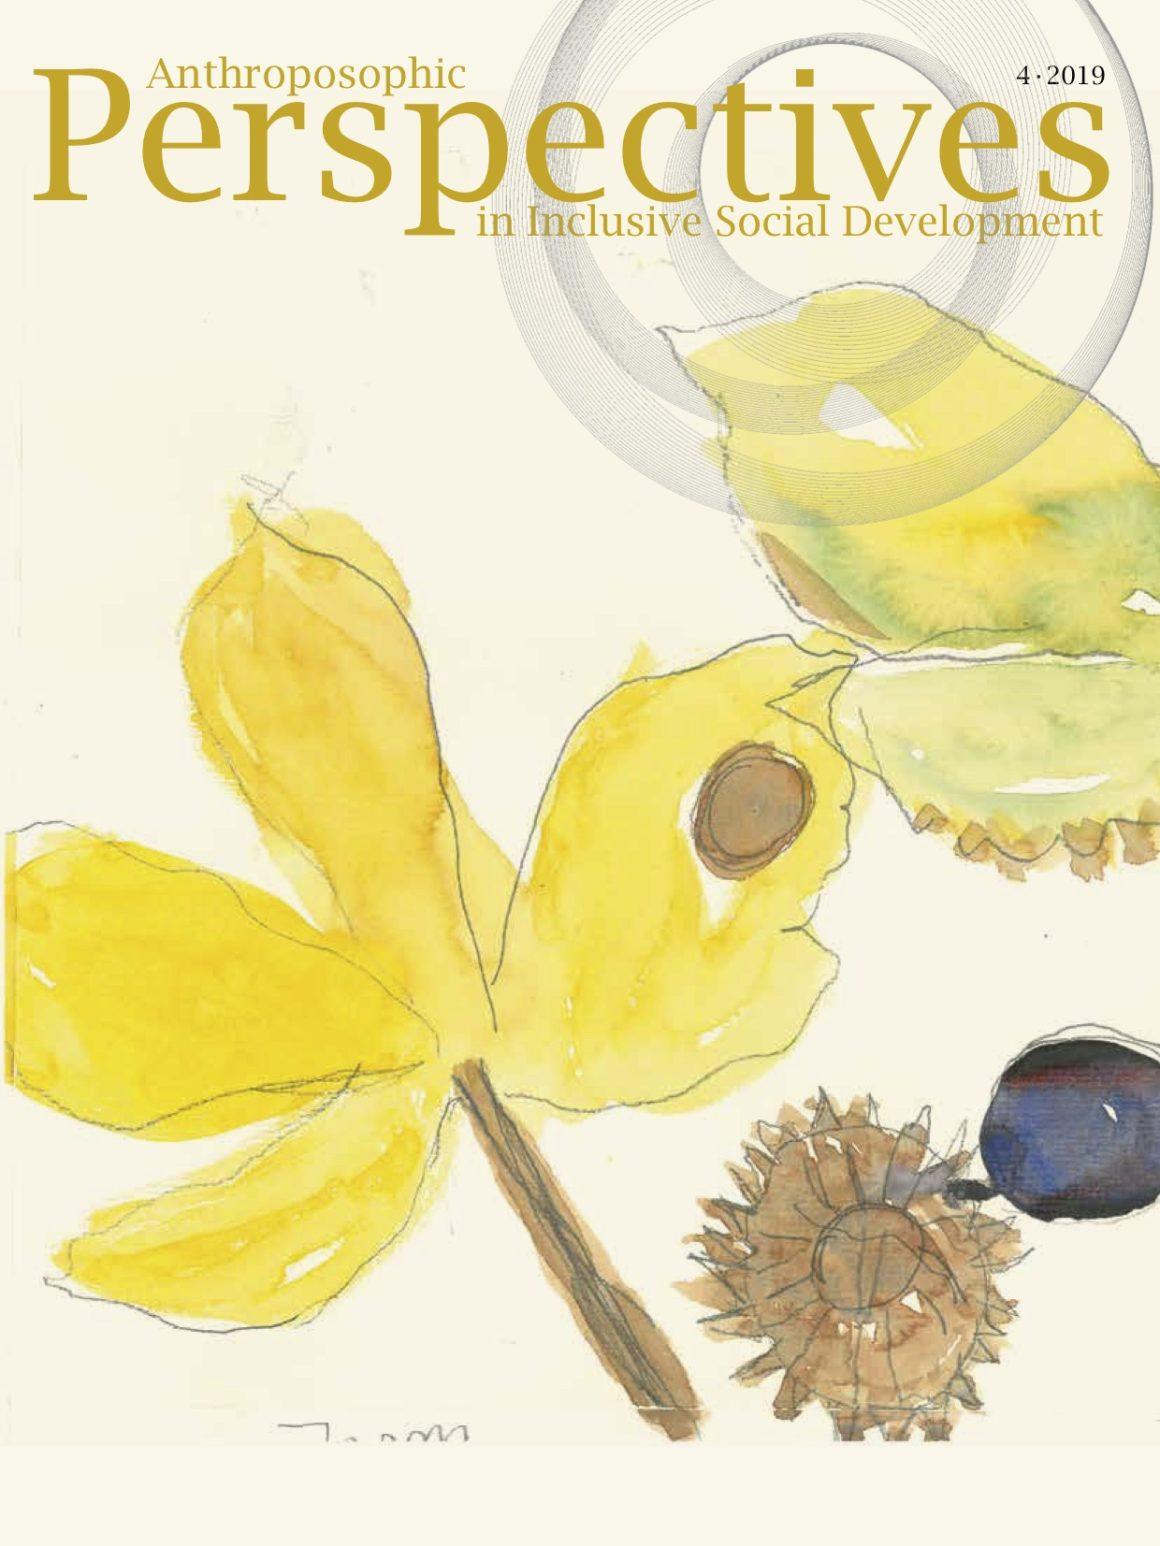 Наш новый журнал по международной: Anthroposophic Perspectives in Inclusive Social Development